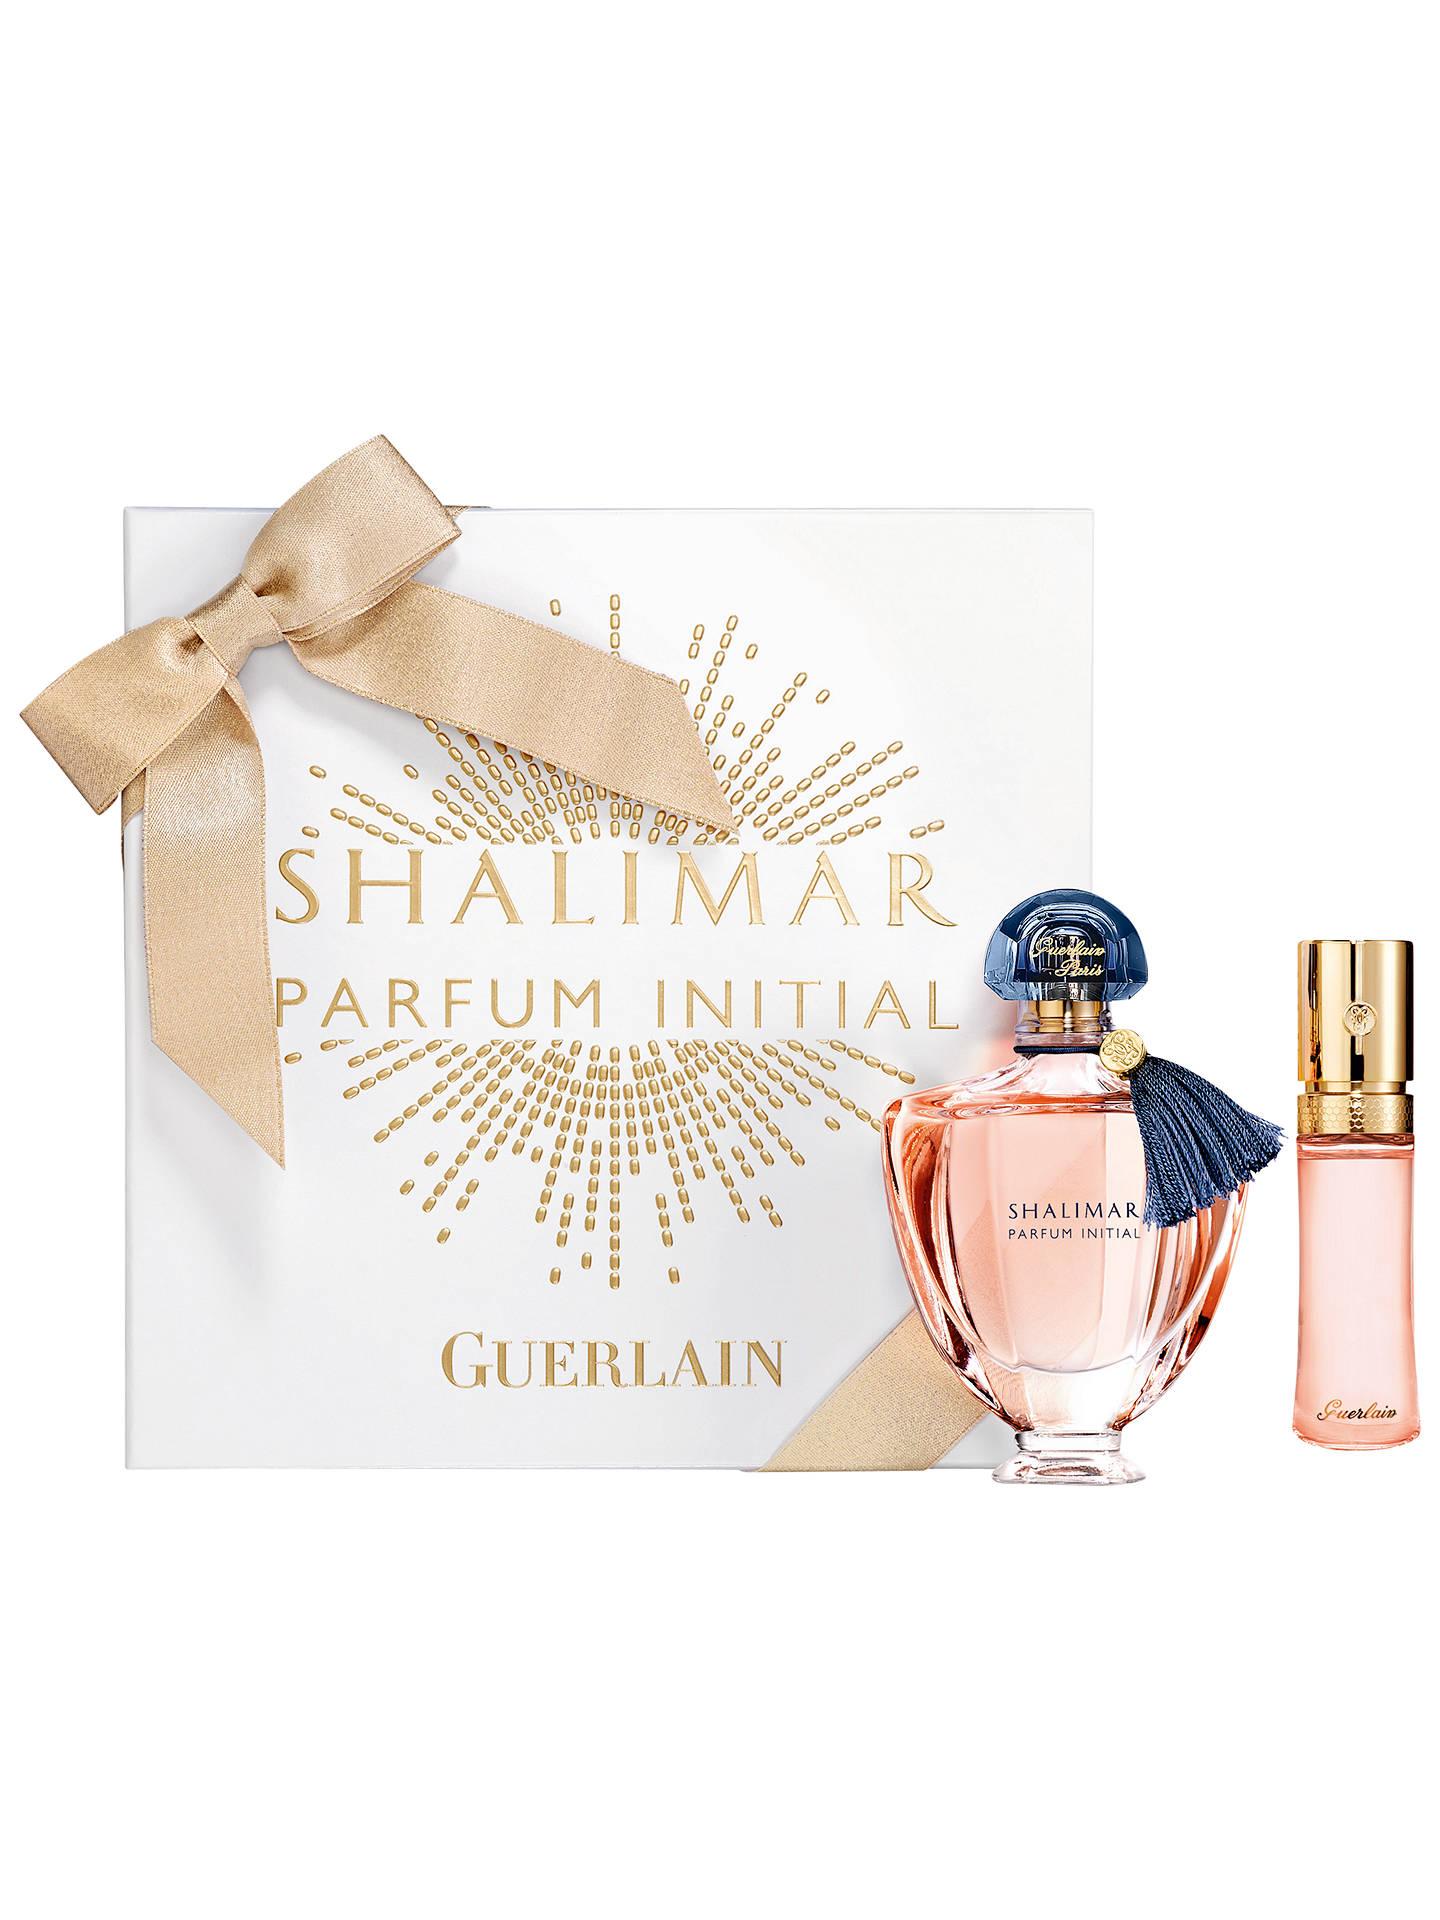 Initial At Guerlain Parfum Eau Gift Shalimar Set40ml De bfyvY7g6